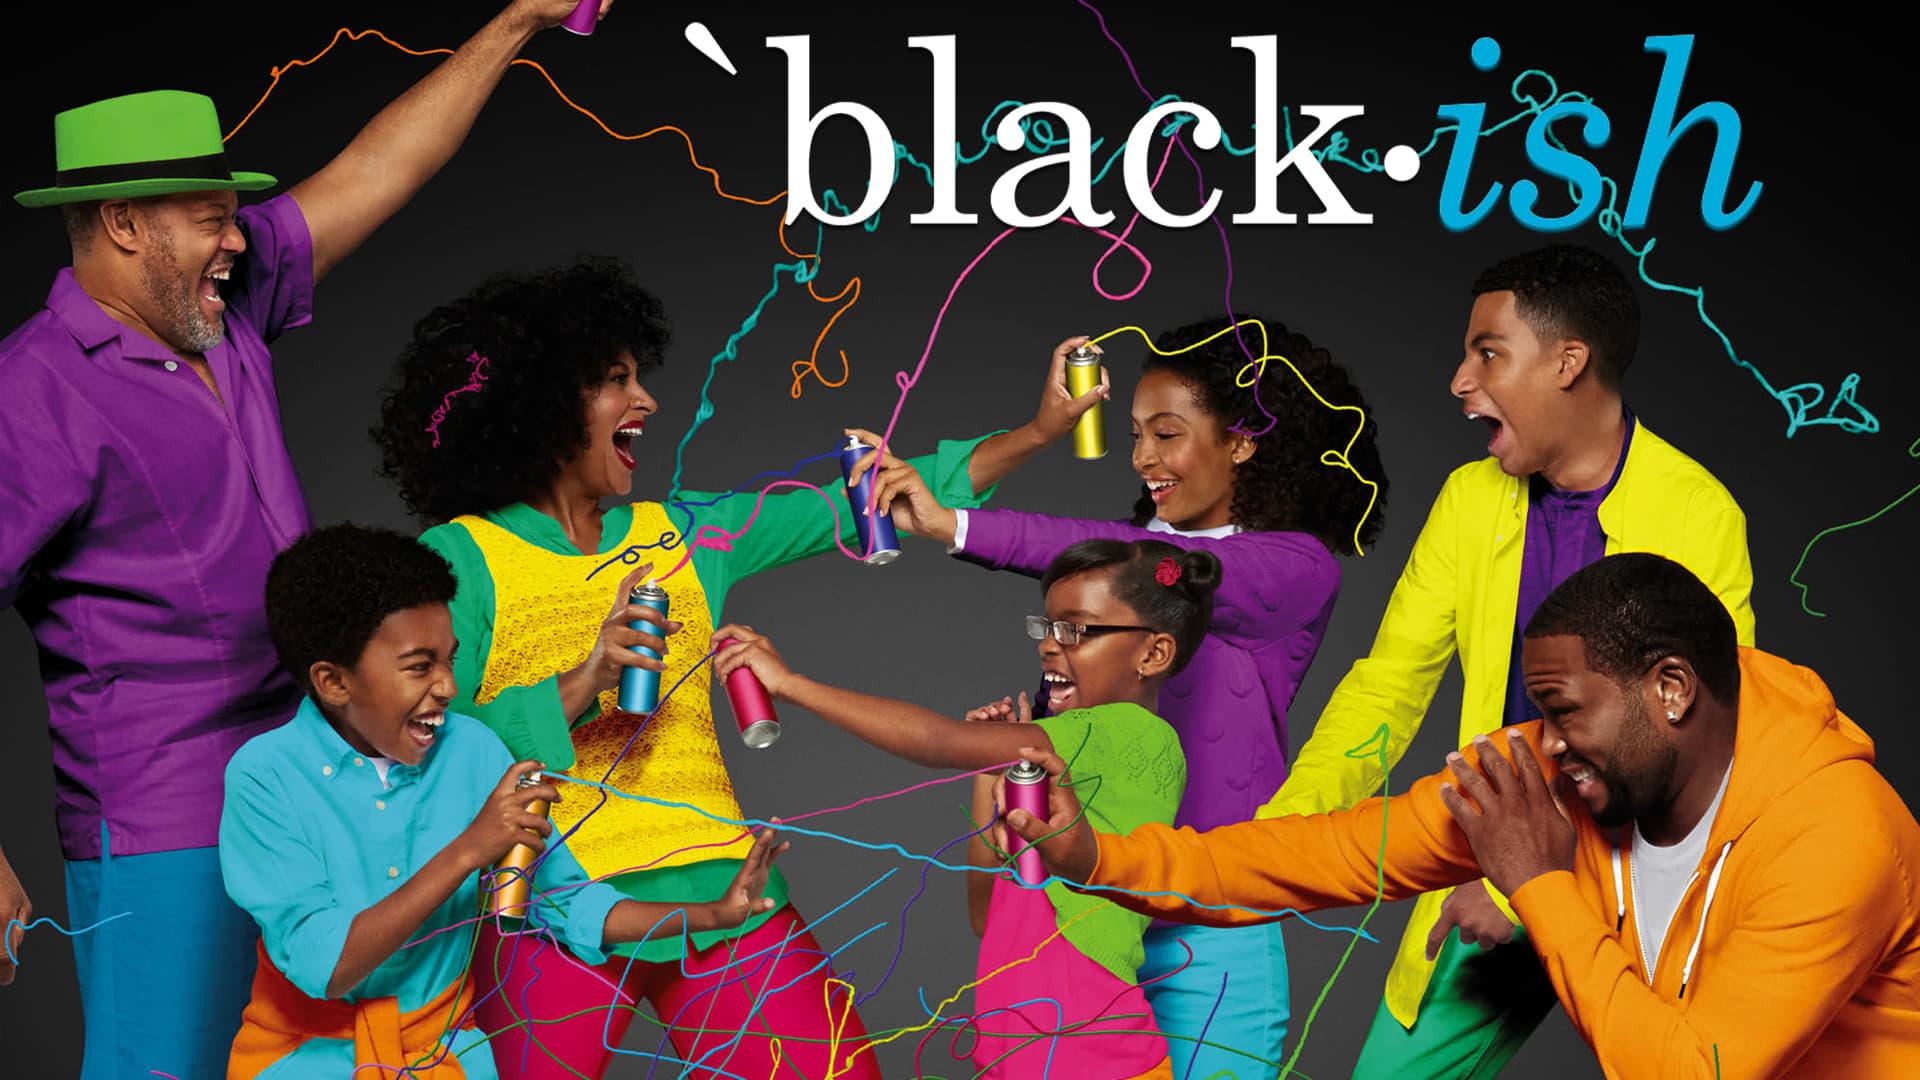 black-ish - Specials